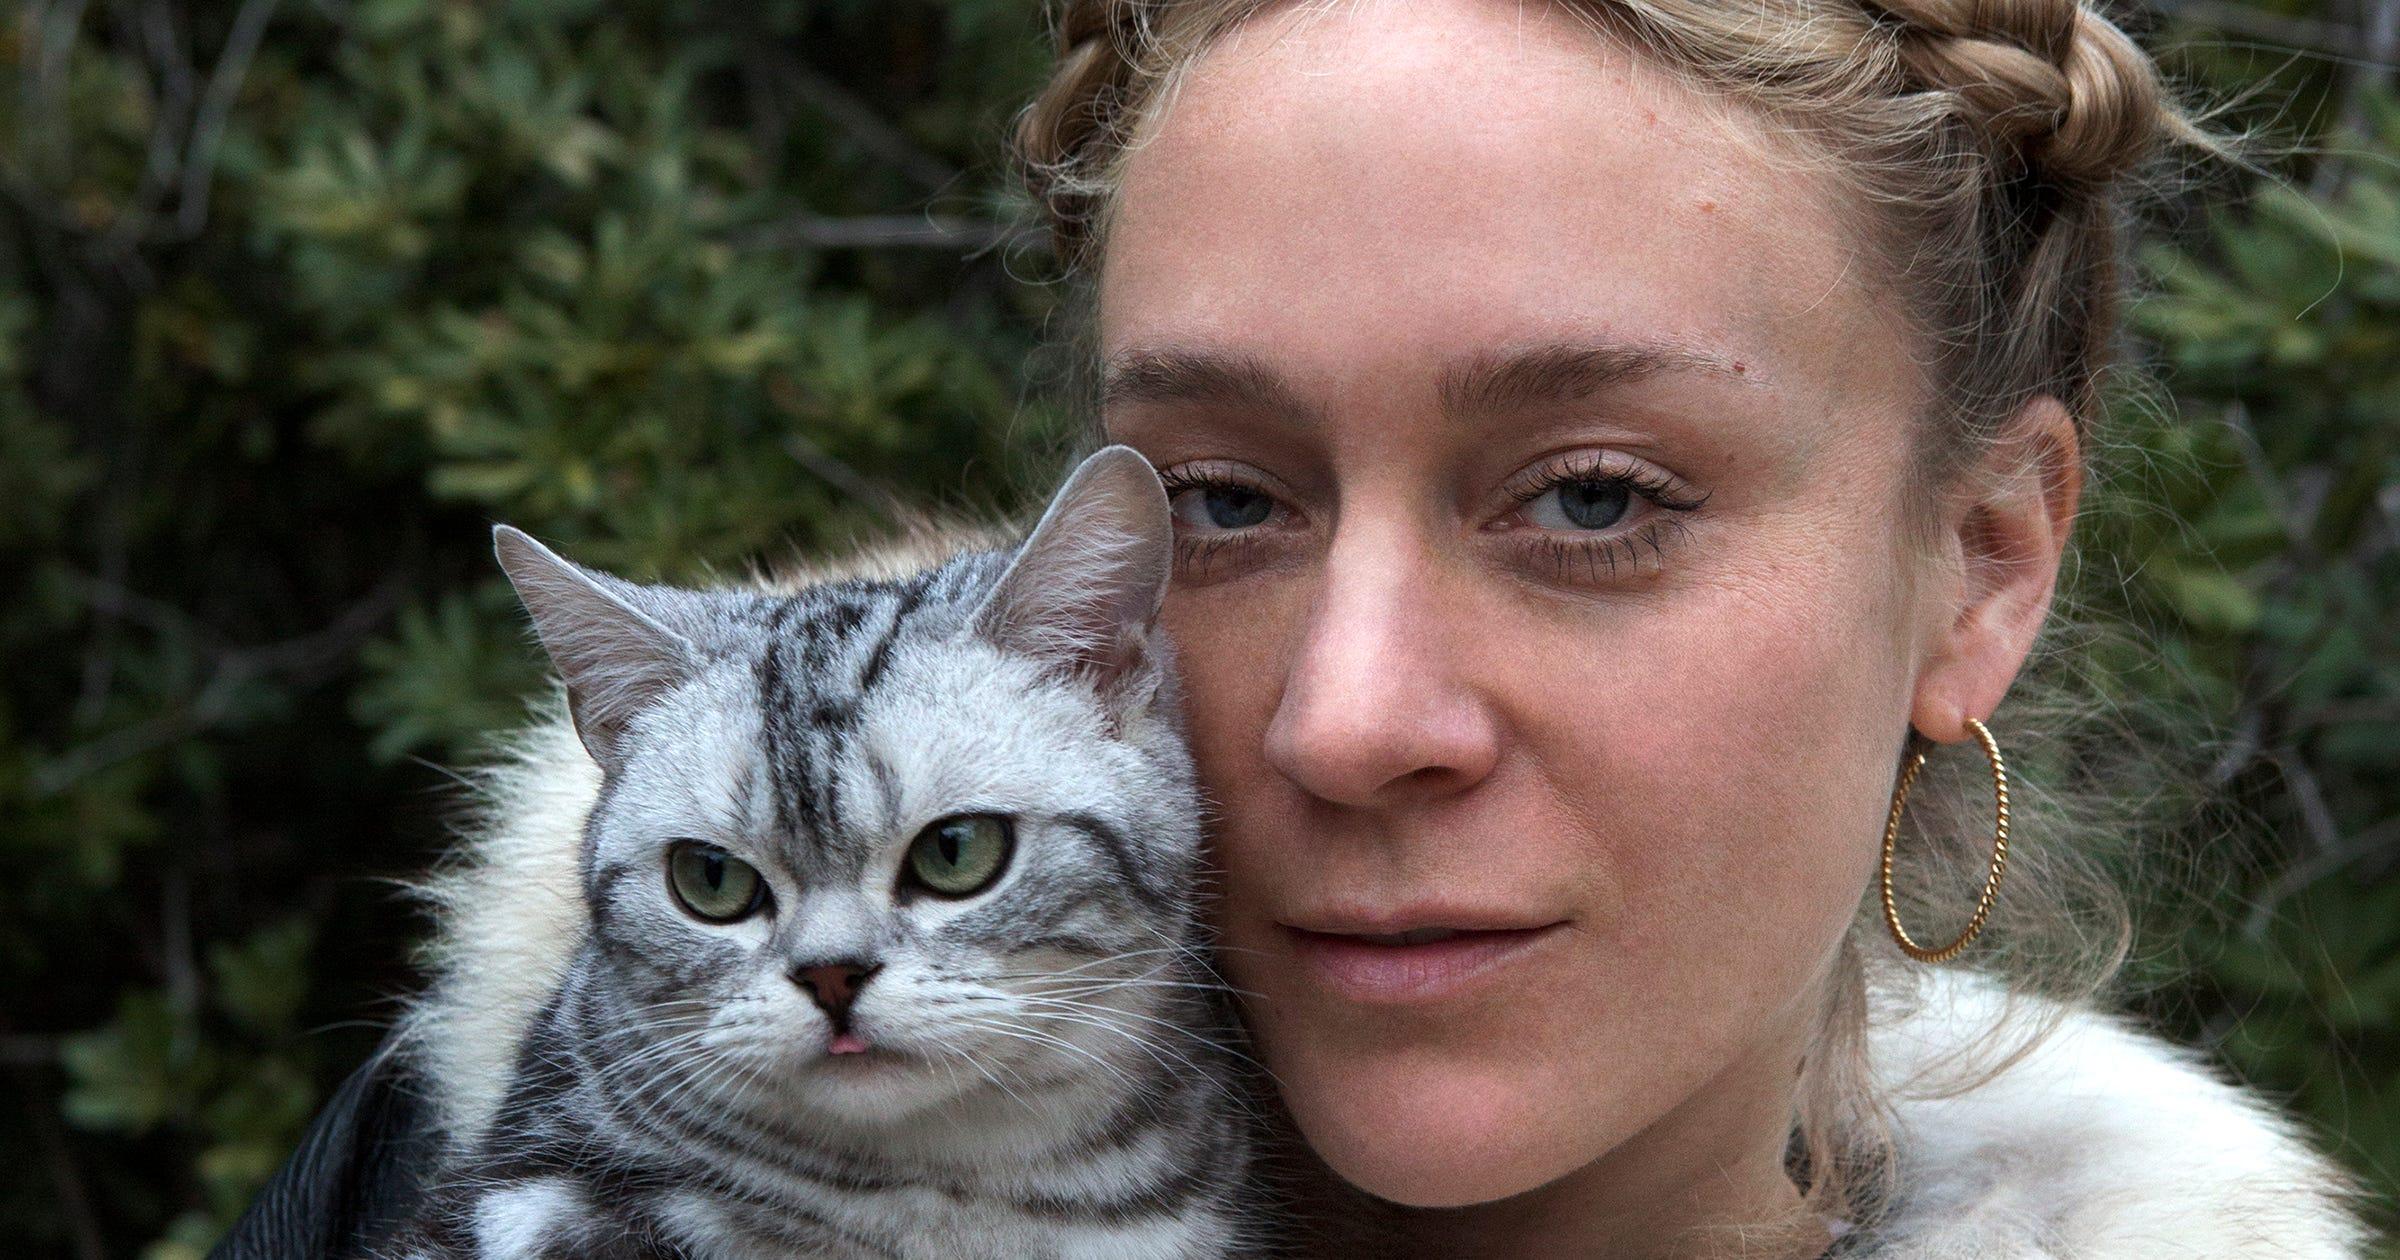 chloe sevigny kitty the movie trailer full short film